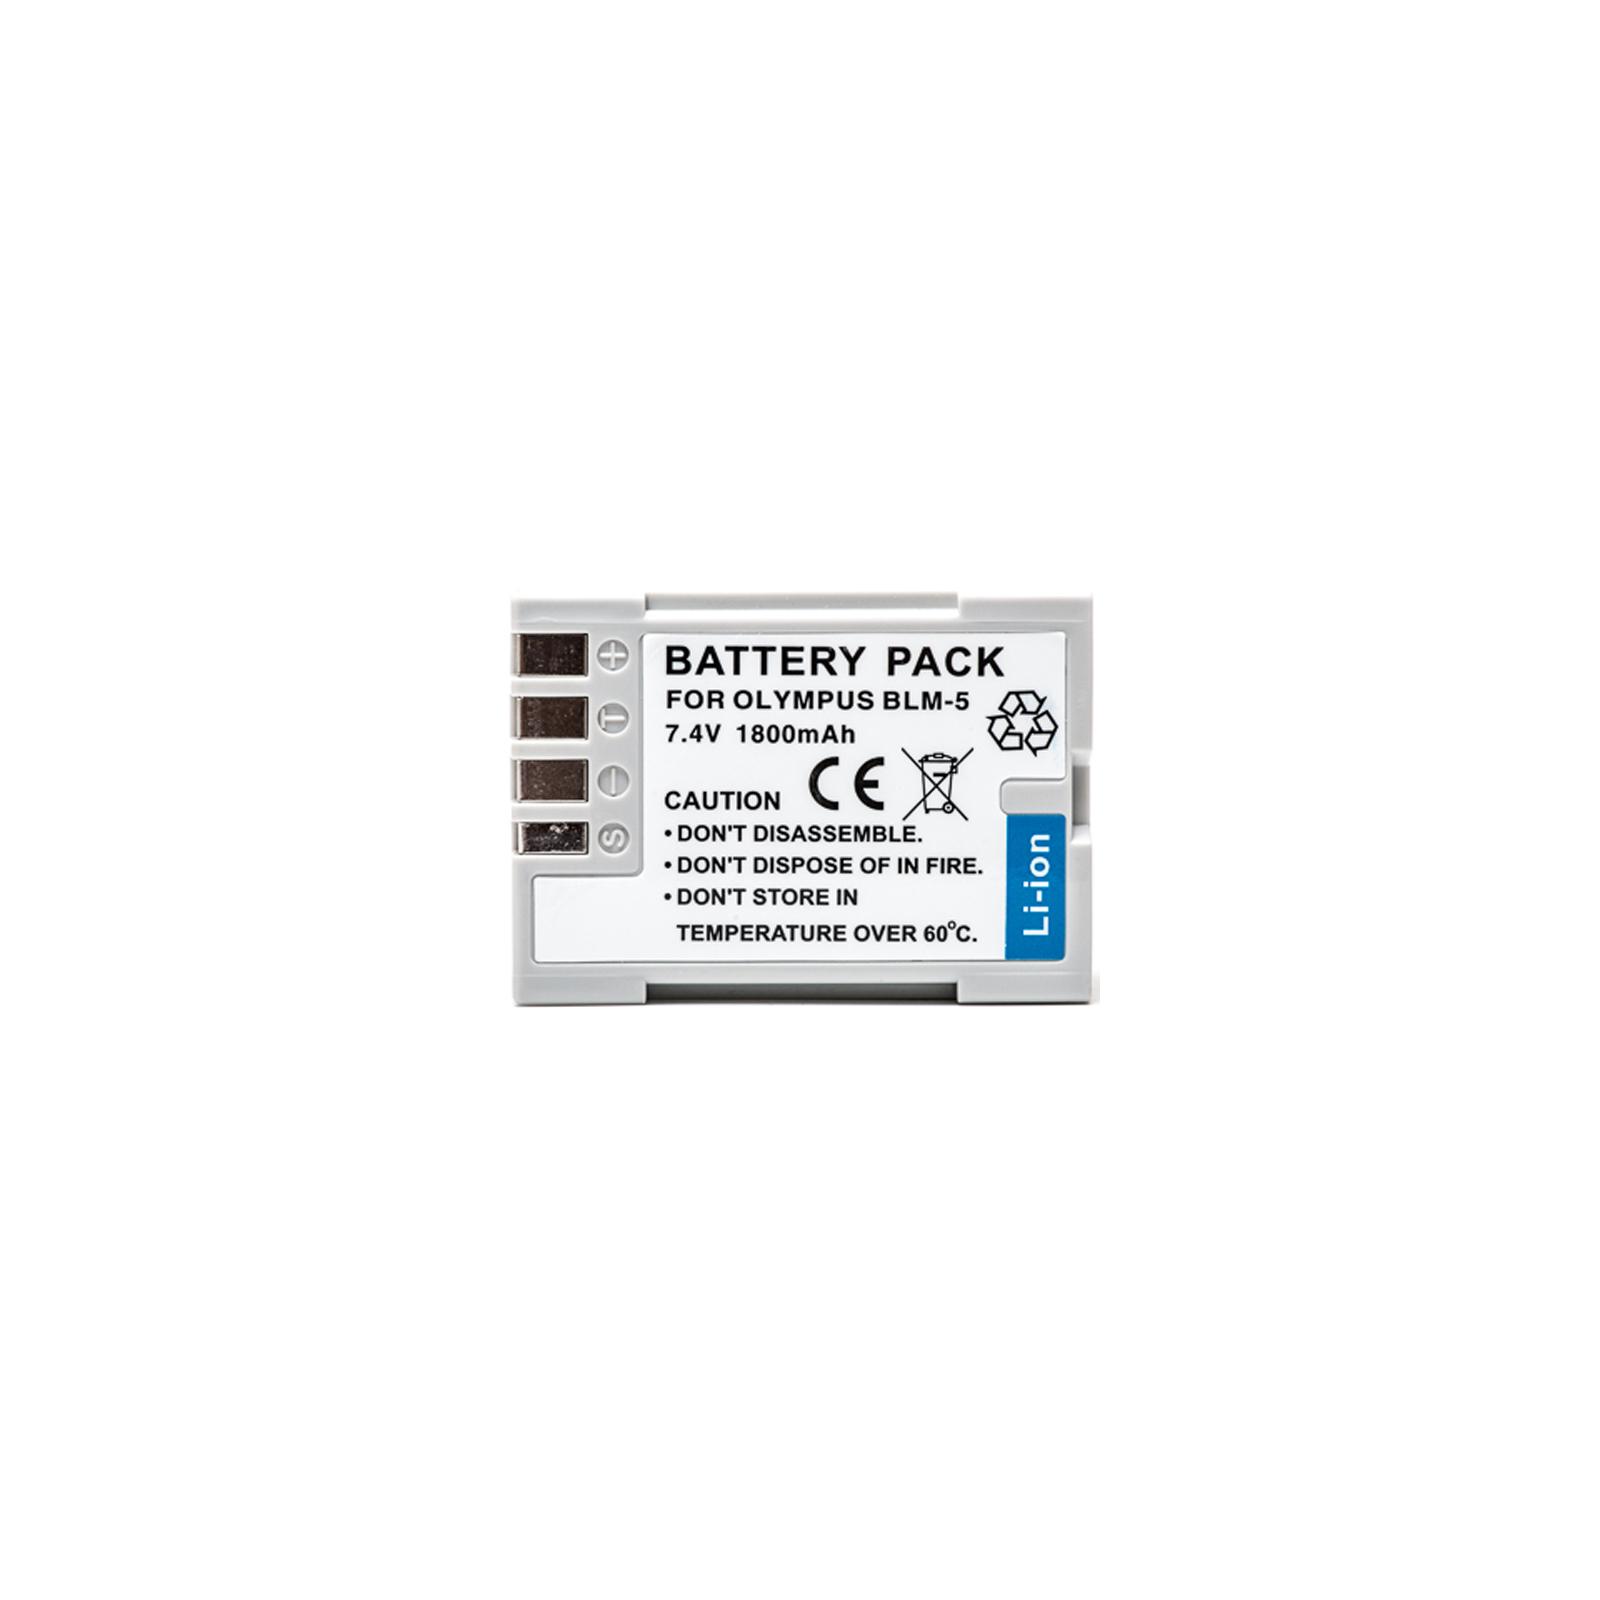 Аккумулятор к фото/видео PowerPlant Olympus PS-BLM5 (DV00DV1286) изображение 2